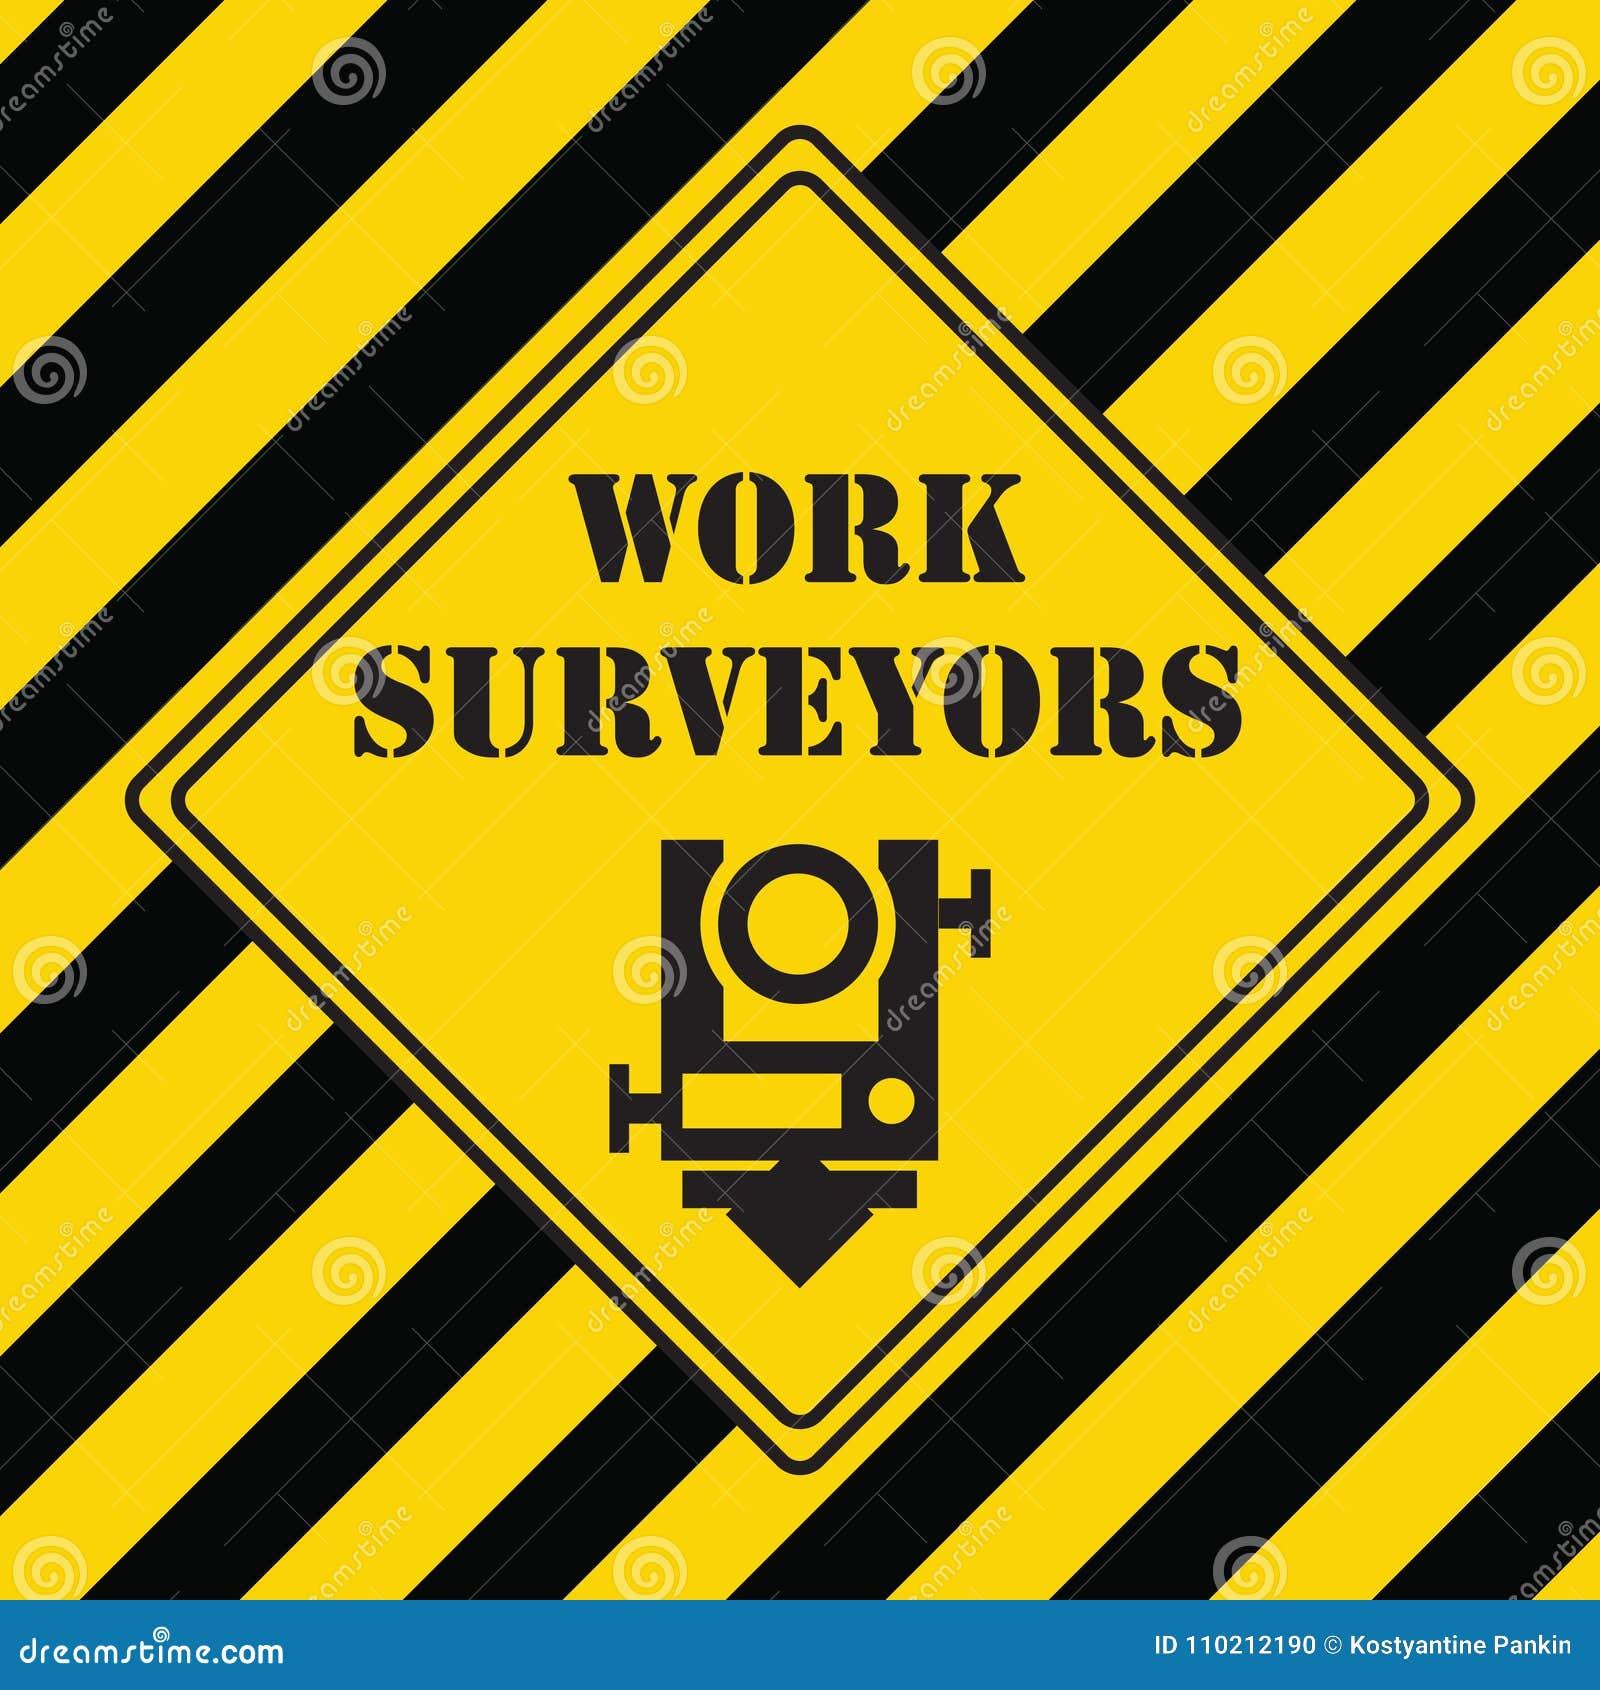 Industrial Symbol For Surveying Stock Vector Illustration Of Range